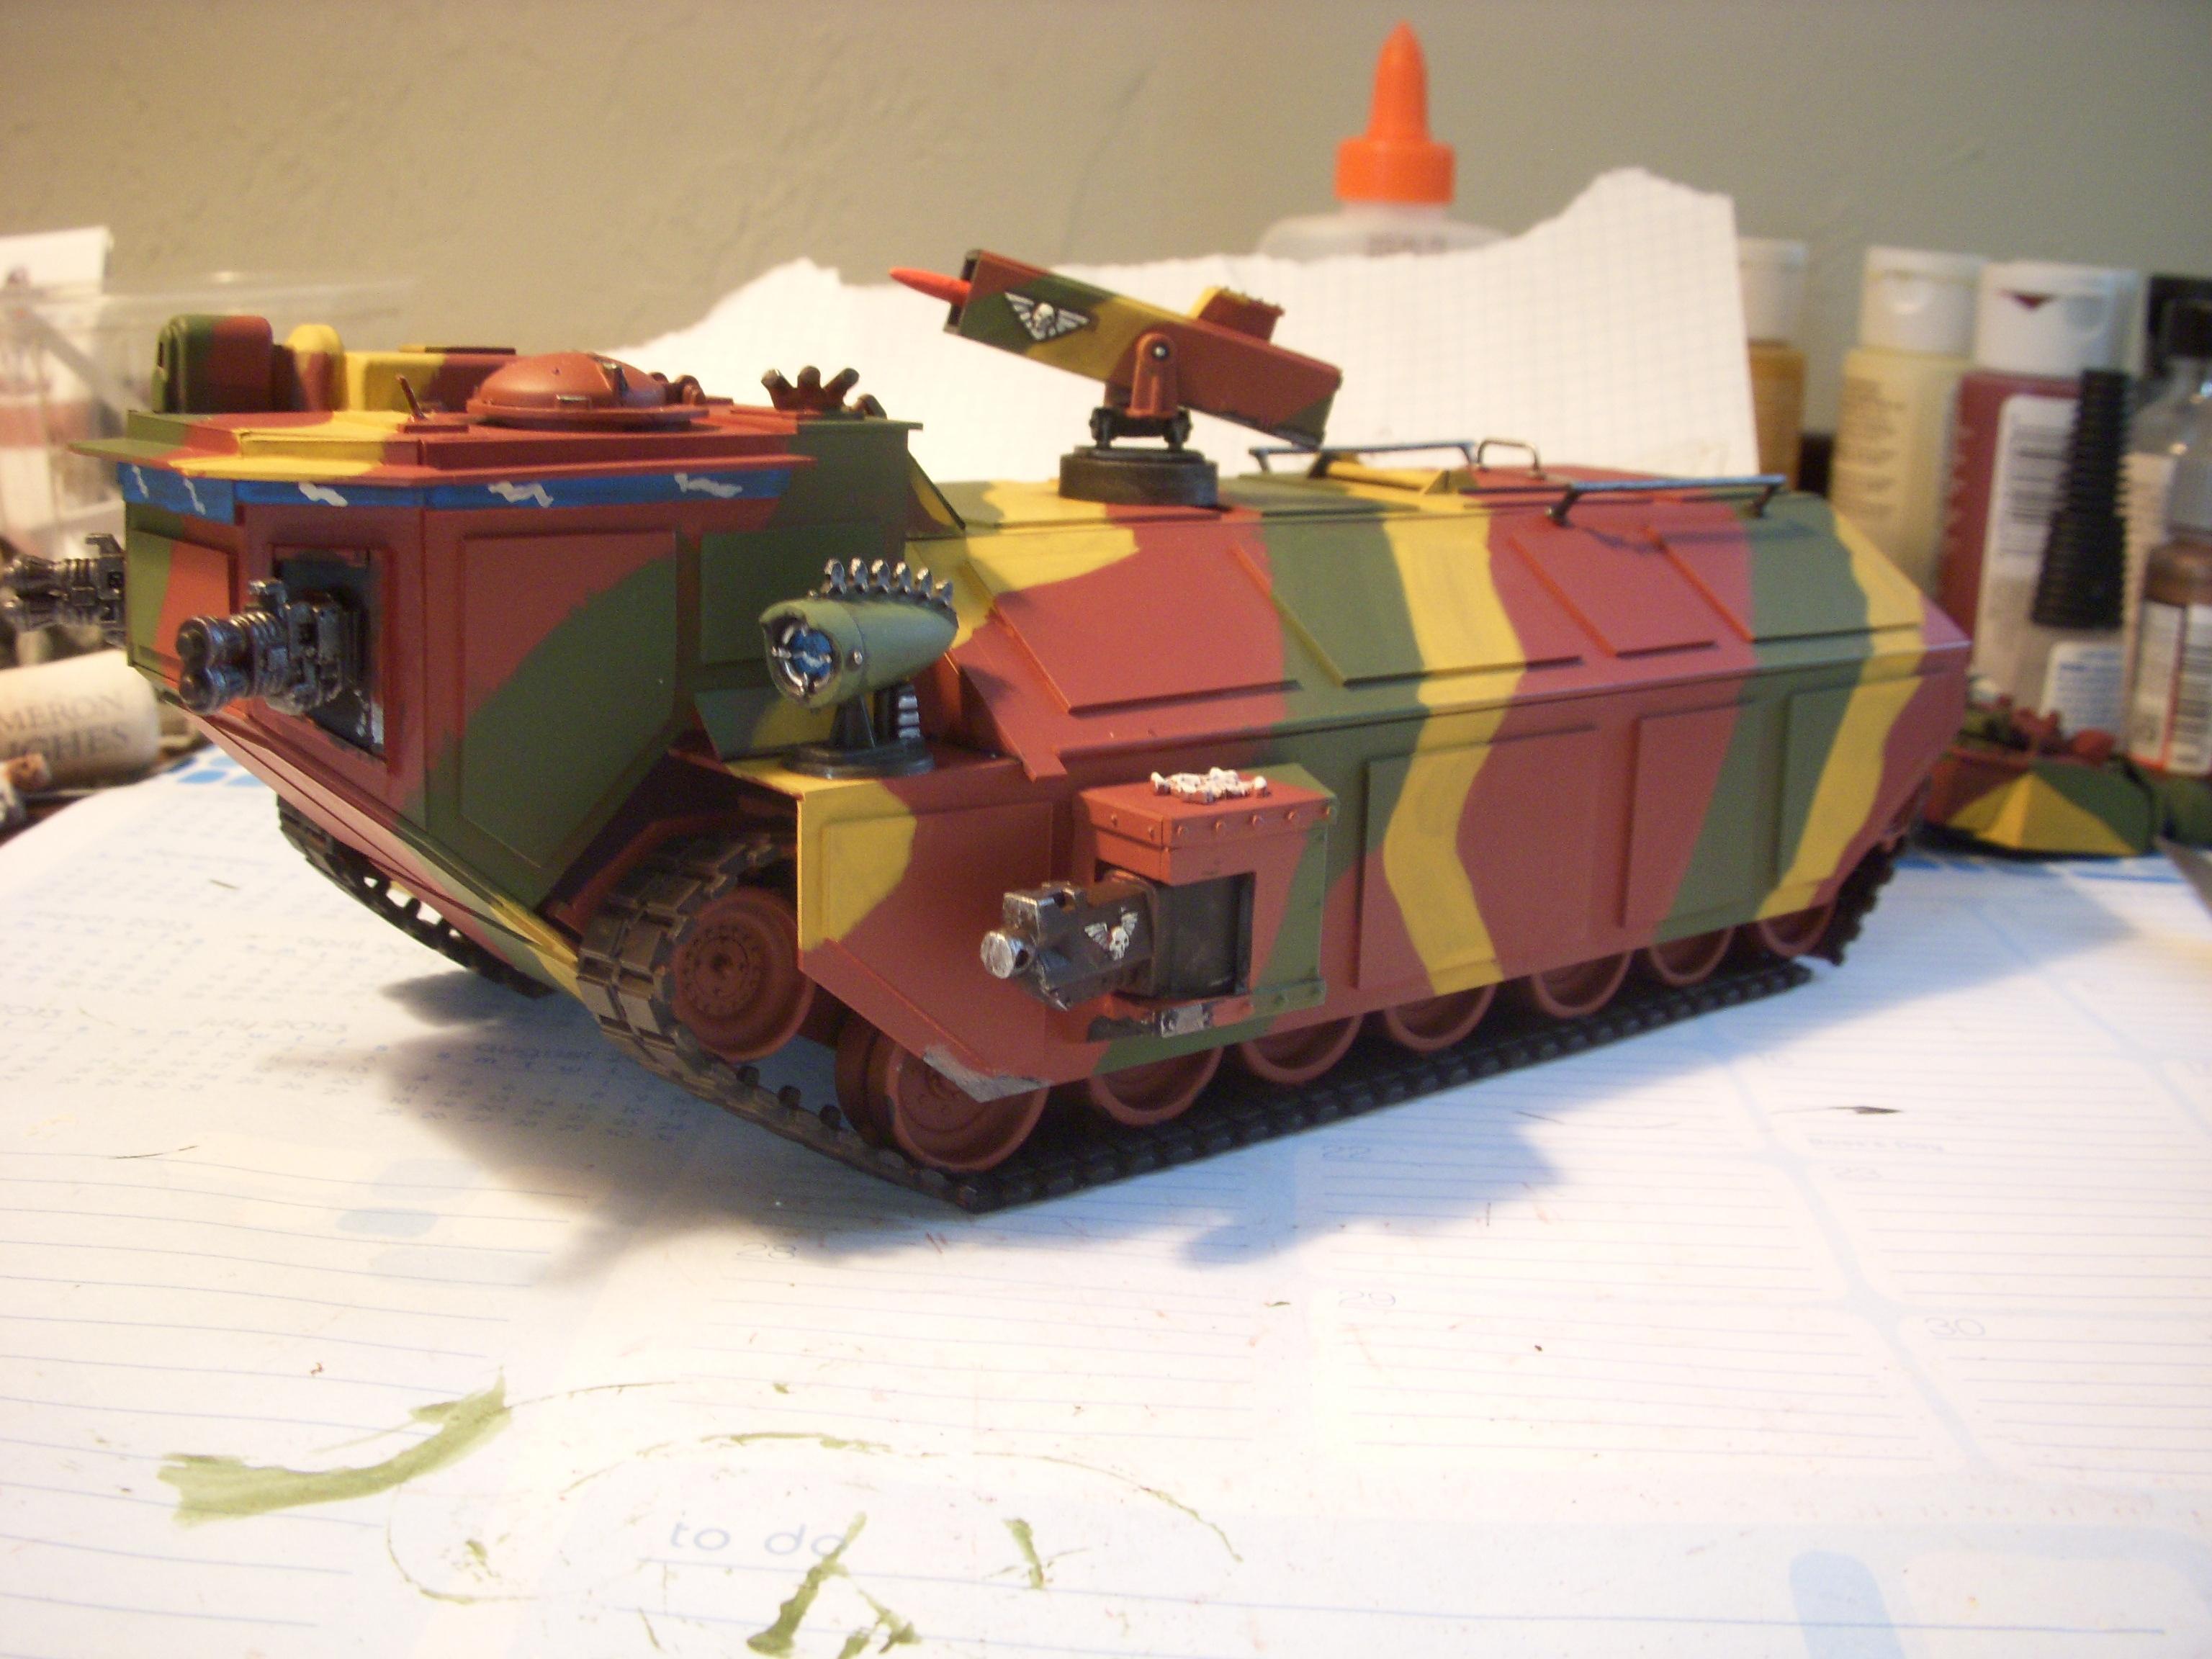 Crassus, Crassus Armored Assault Transport, Imperial Guard, Scratch Build, Work In Progress